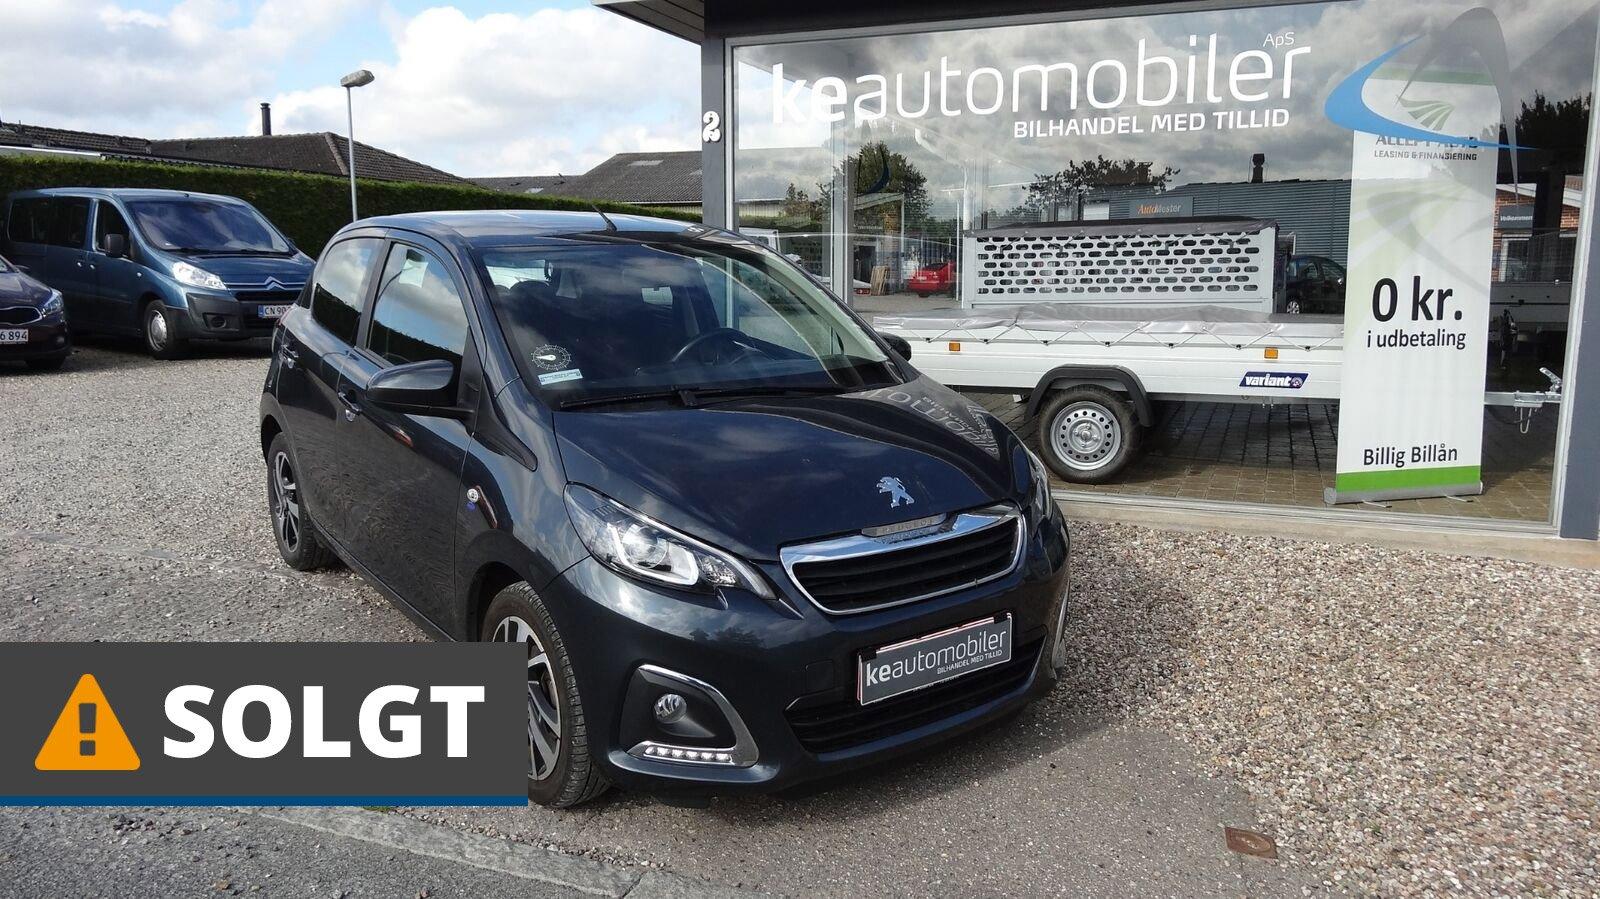 Peugeot 108 E-VTi 69 Allure 1,0 Benzin 69 Hk (2016) // SOLGT